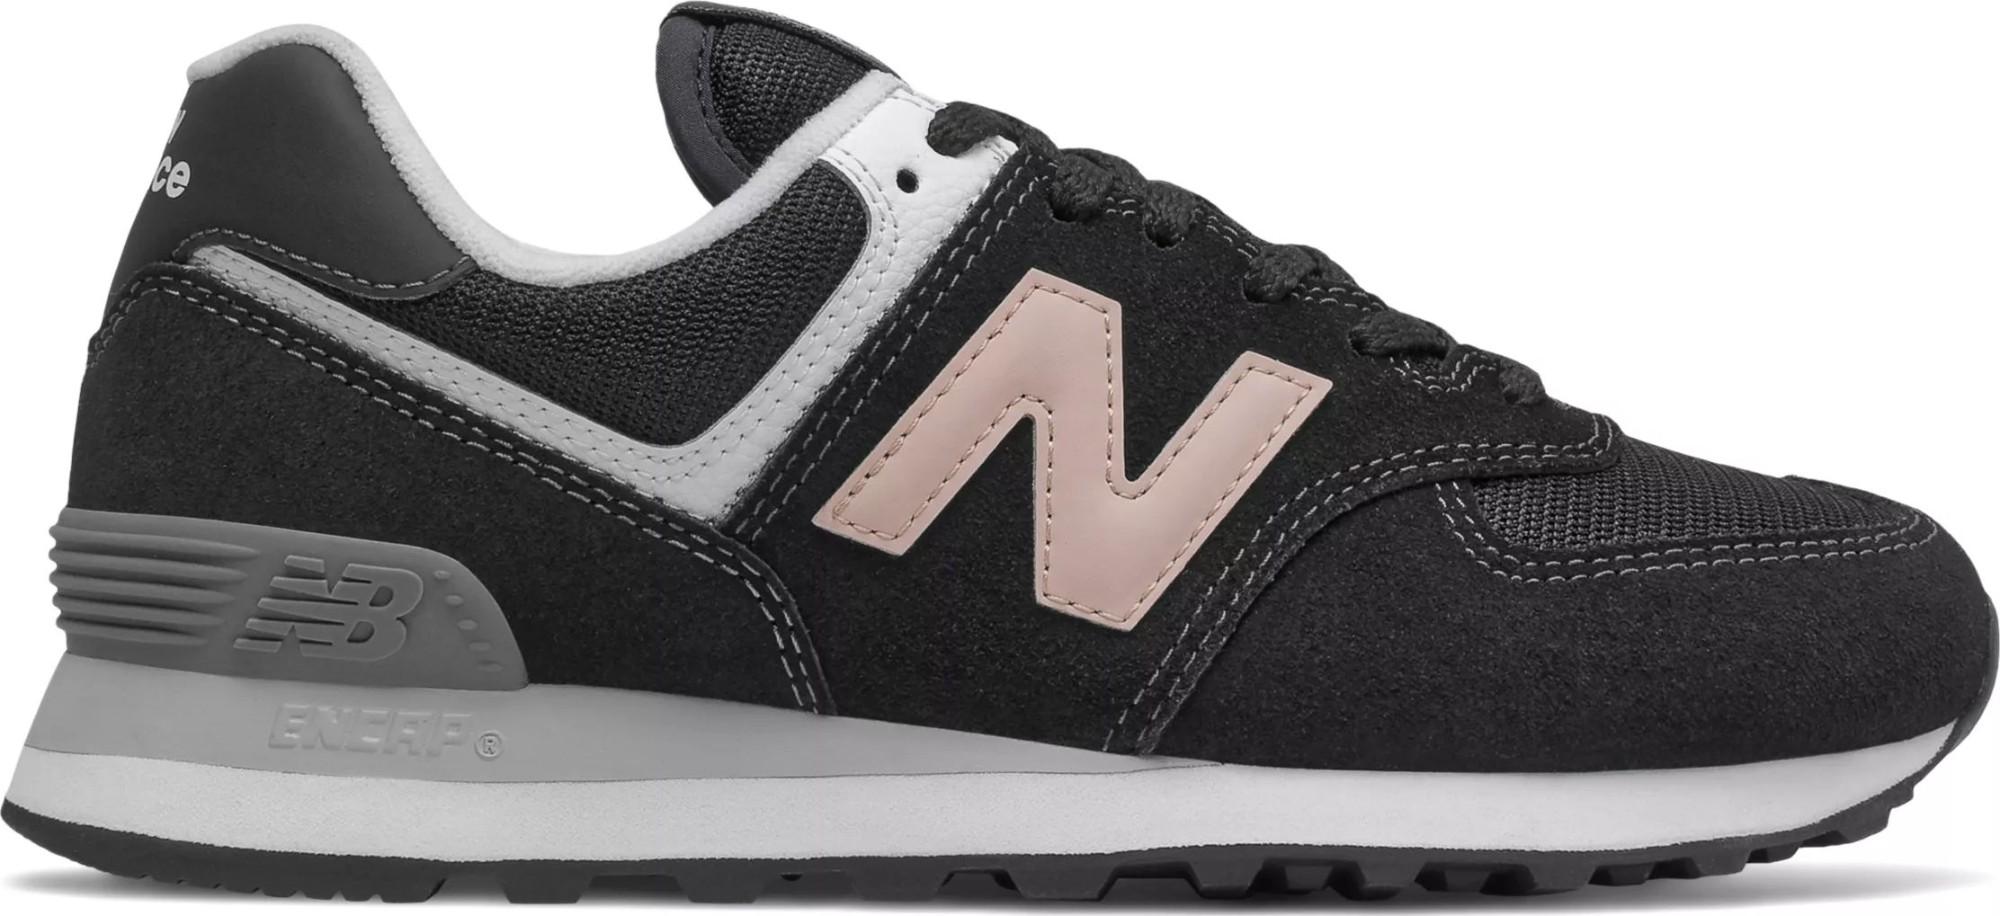 New Balance WL574 Black HB2 39